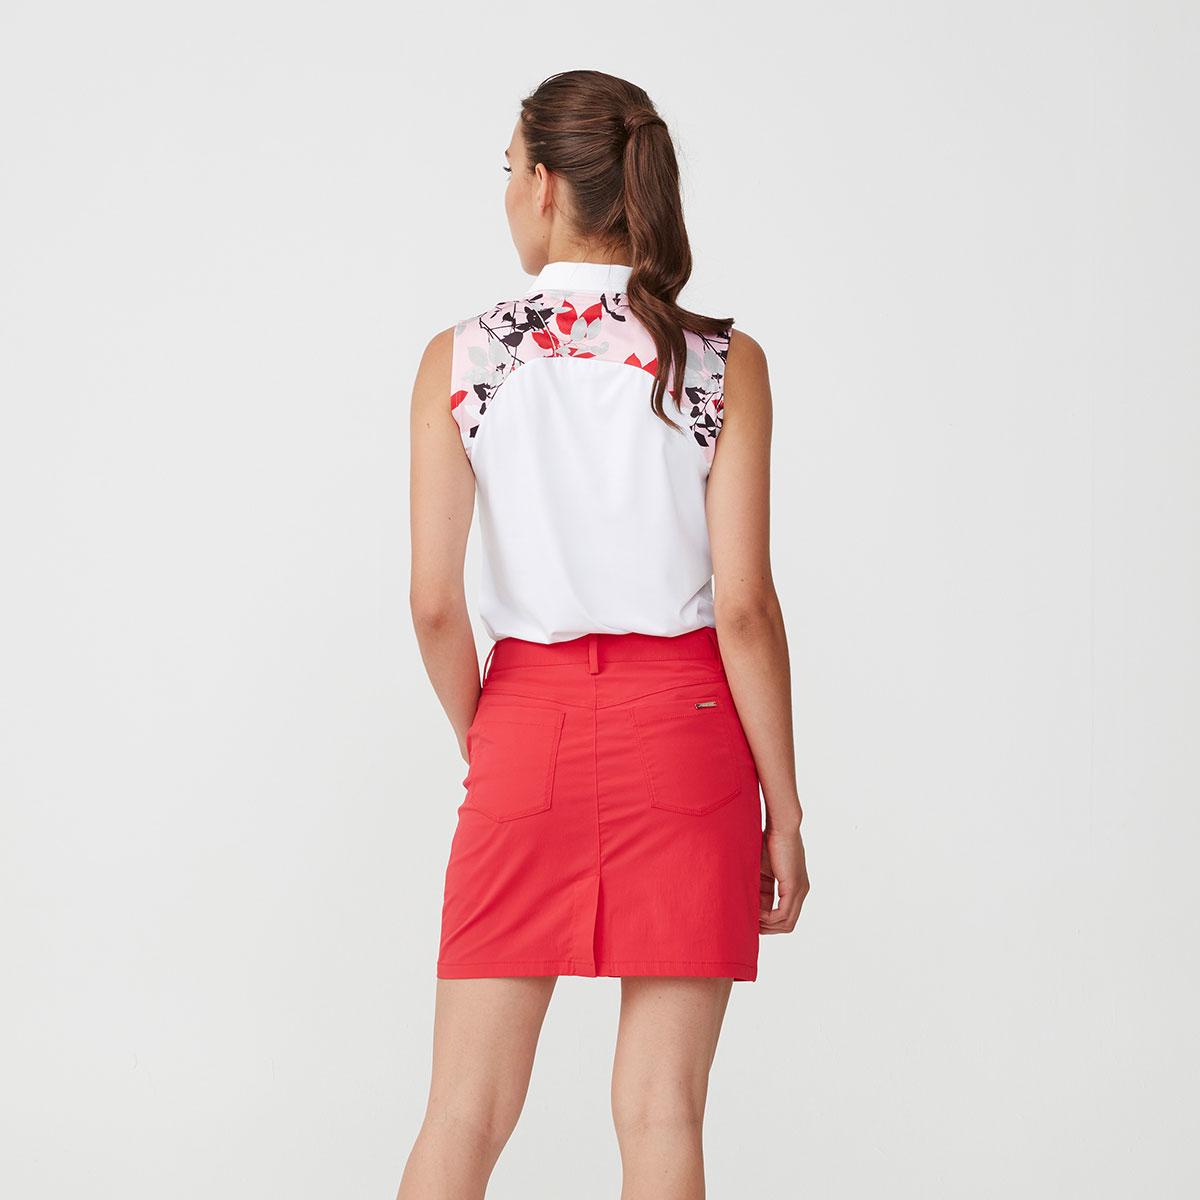 e4affb7a Röhnisch Leaf Sleeveless Ladies Polo Shirt. Rohnisch Polo Leaf SL S9 ...